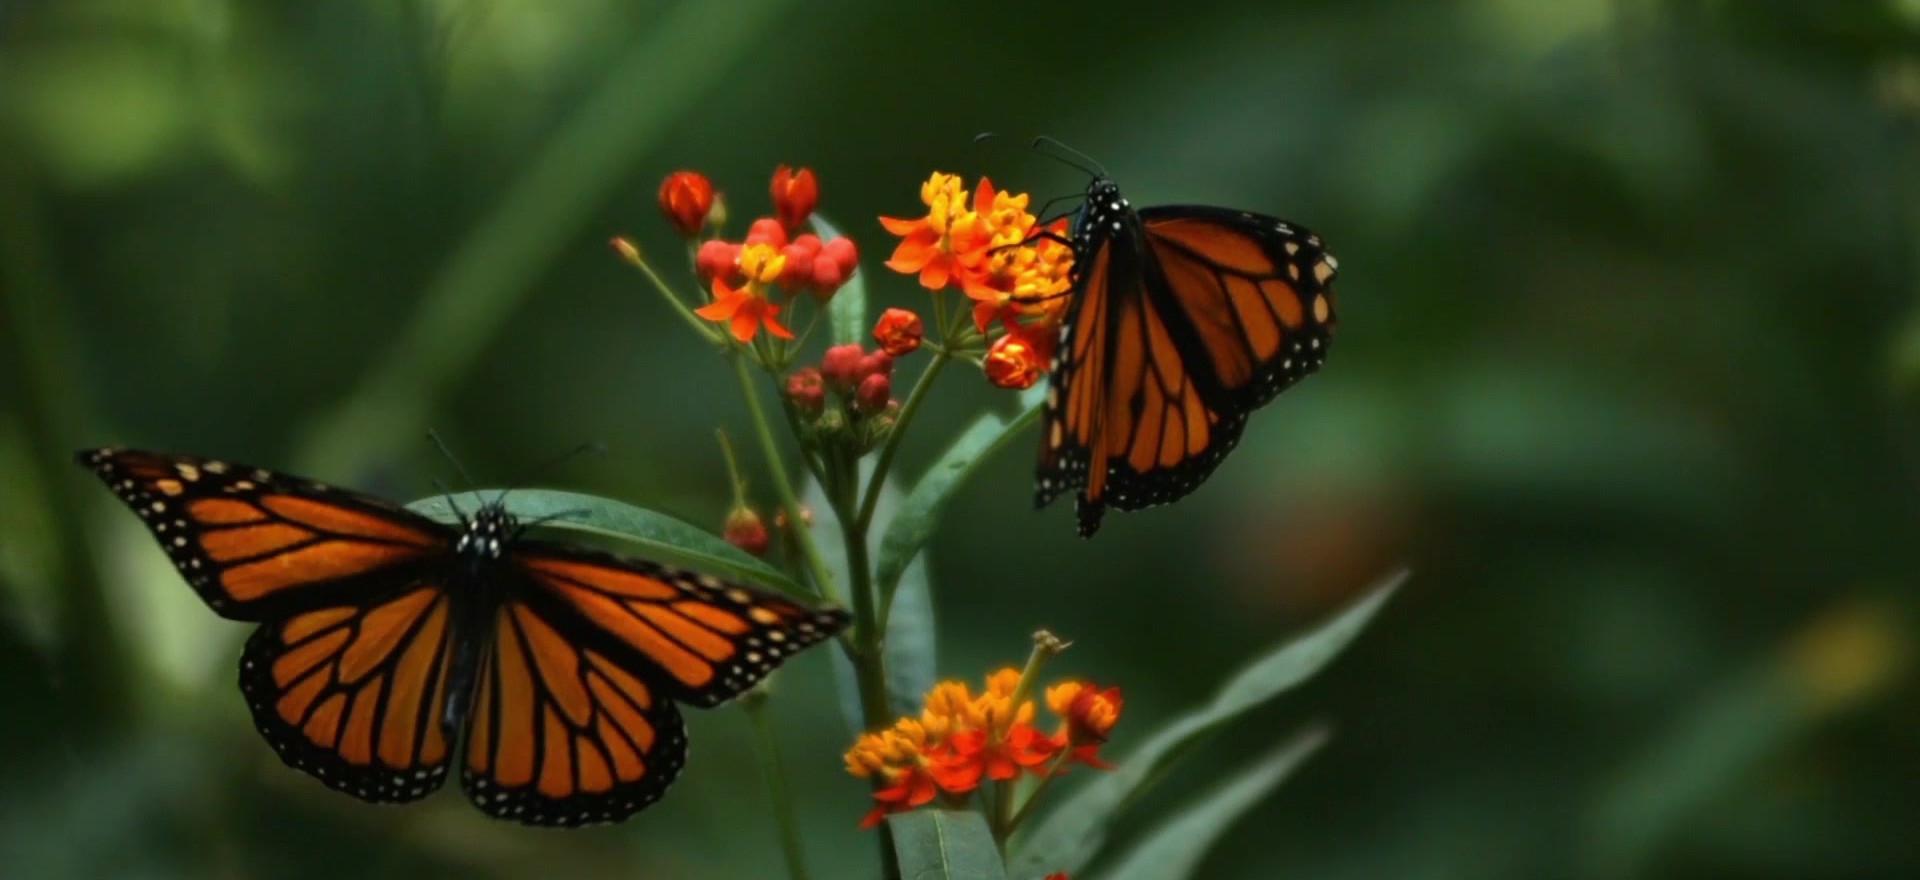 Dos mariposas hermosas